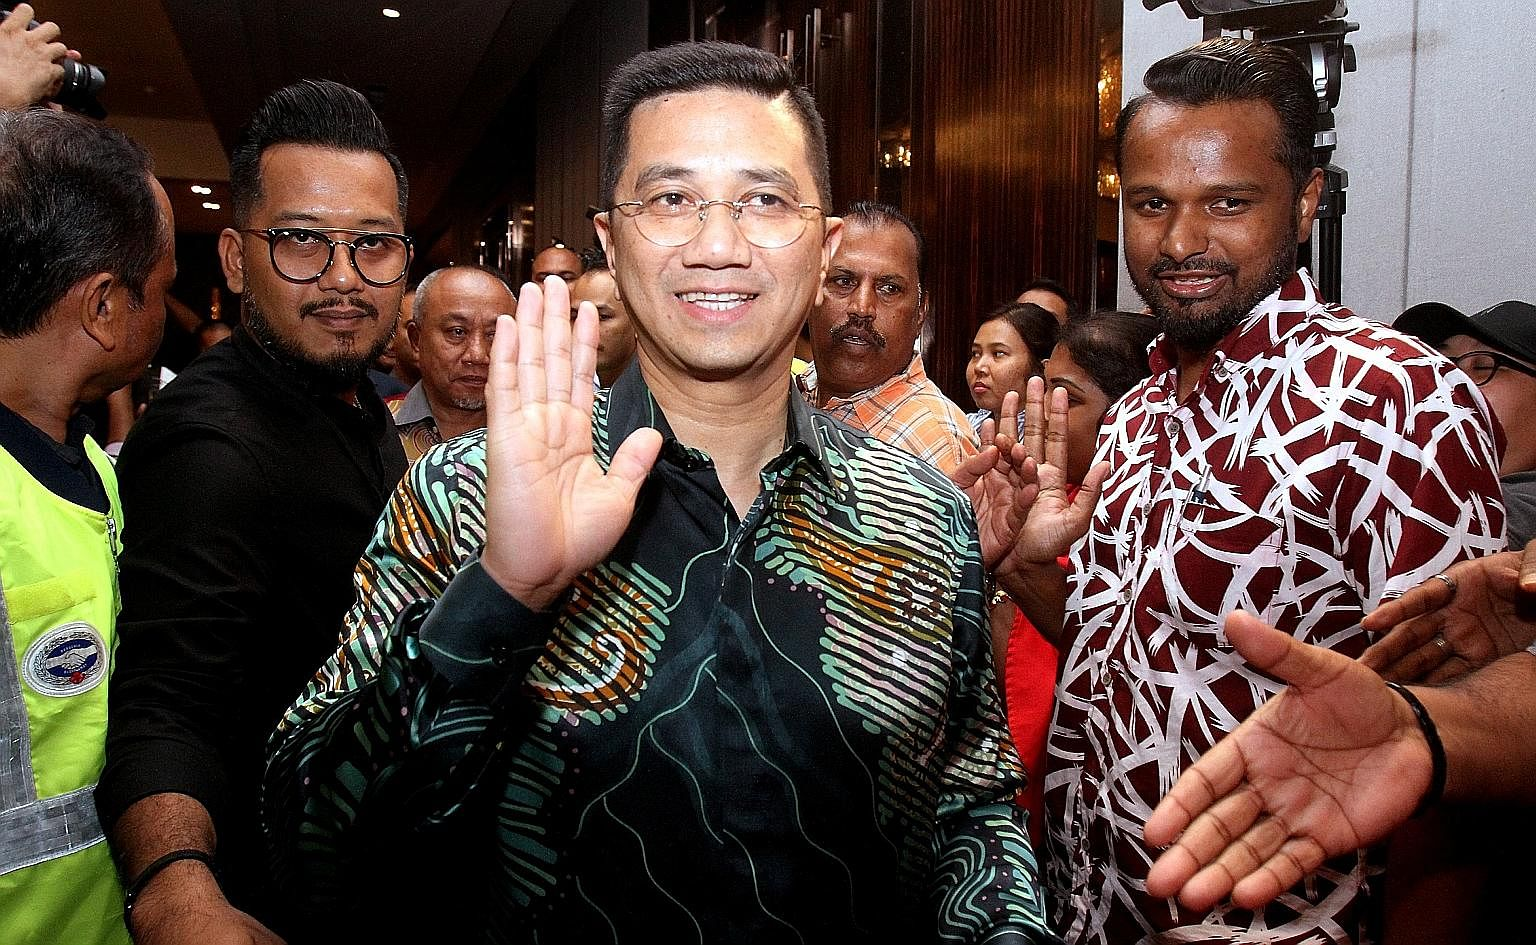 PKR主席安瓦尔·易卜拉欣(Anwar Ibrahim)的前任副主席拿督斯里·阿兹敏·阿里(Datuk Seri Azmin Ali)似乎对自己担任总理抱有自己的愿望,并带领一群异议人士脱离了PKR。